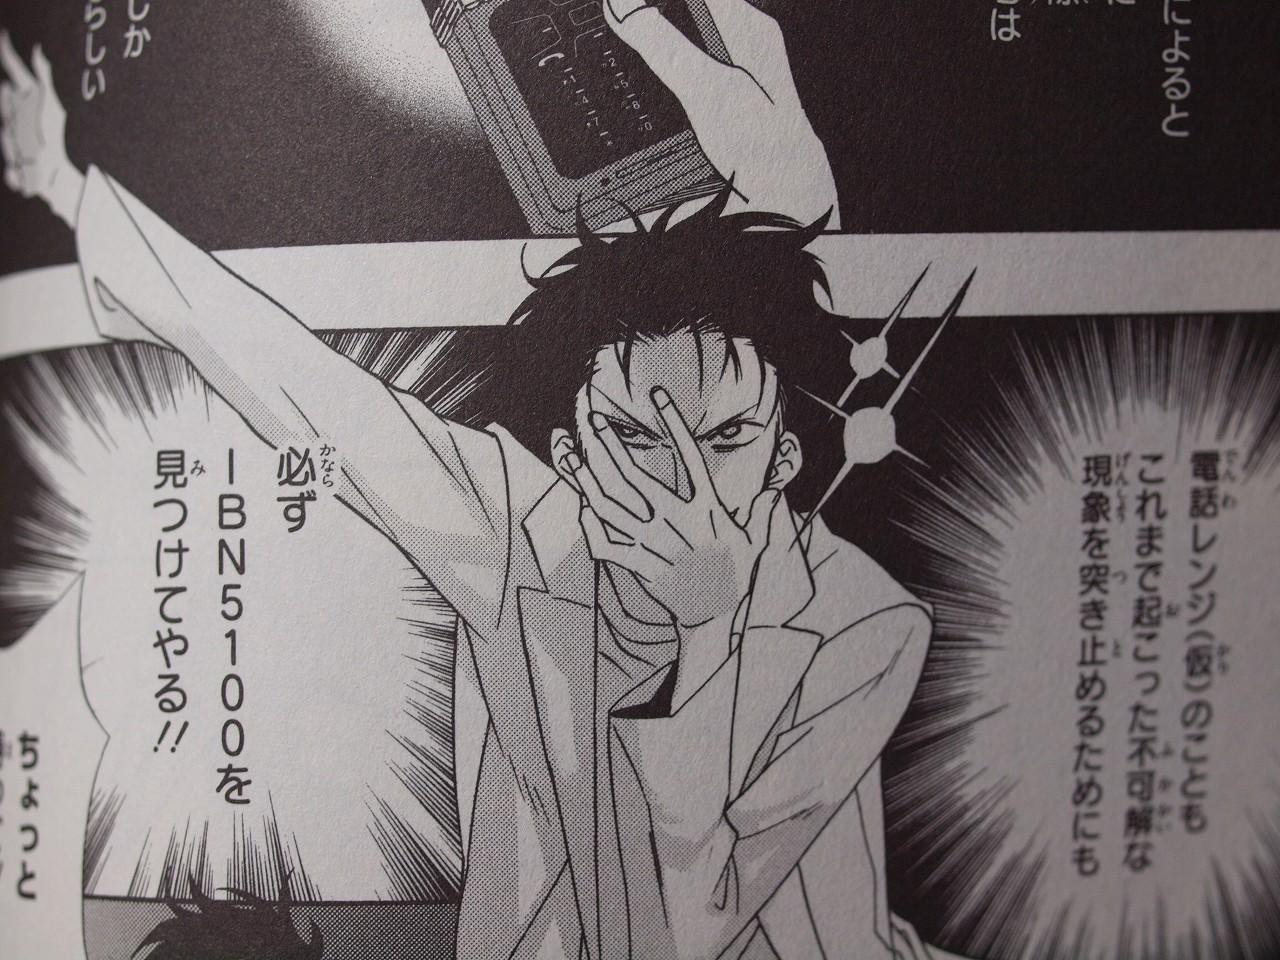 STEINS;GATE コミック1巻 オカリン